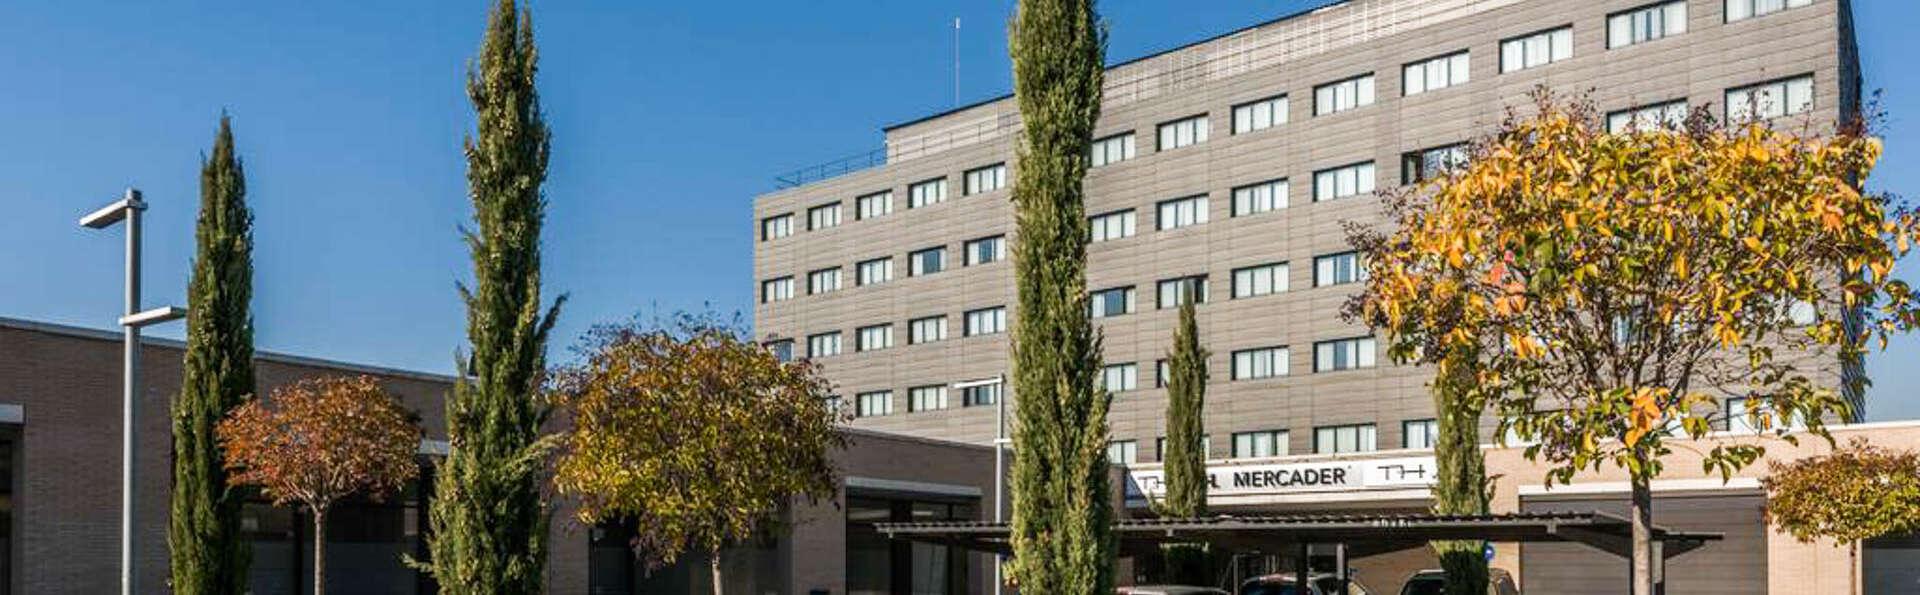 Hotel Mercader - EDIT_FRONT.jpg